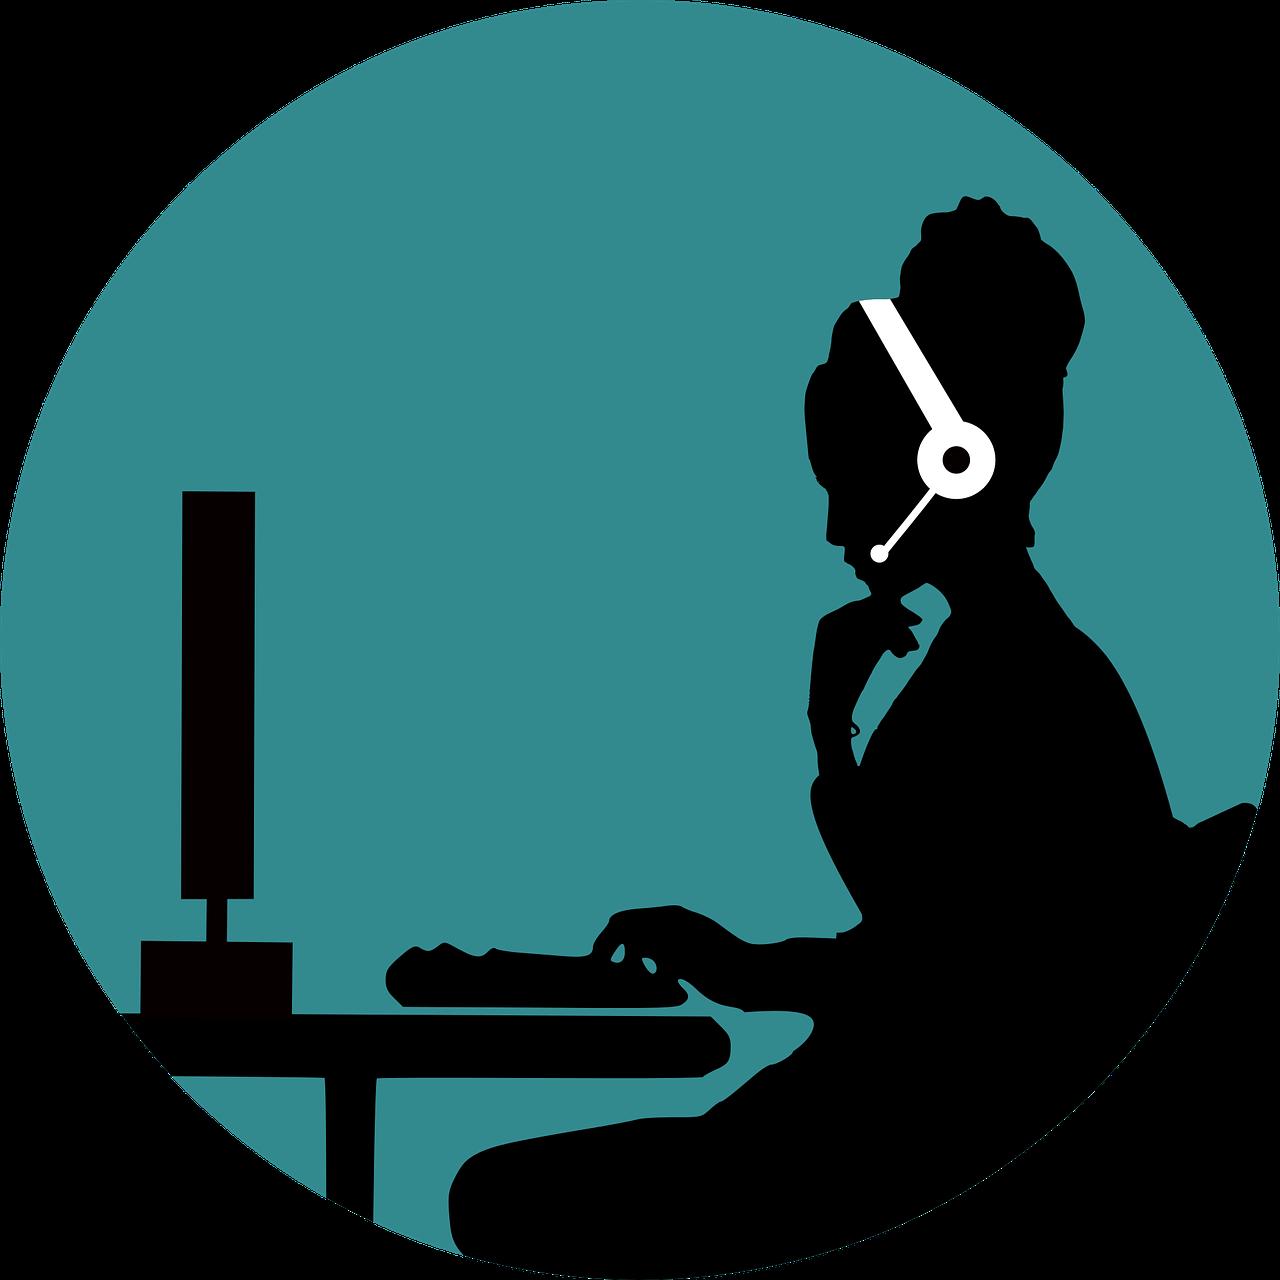 callstar answering service virtual assistant